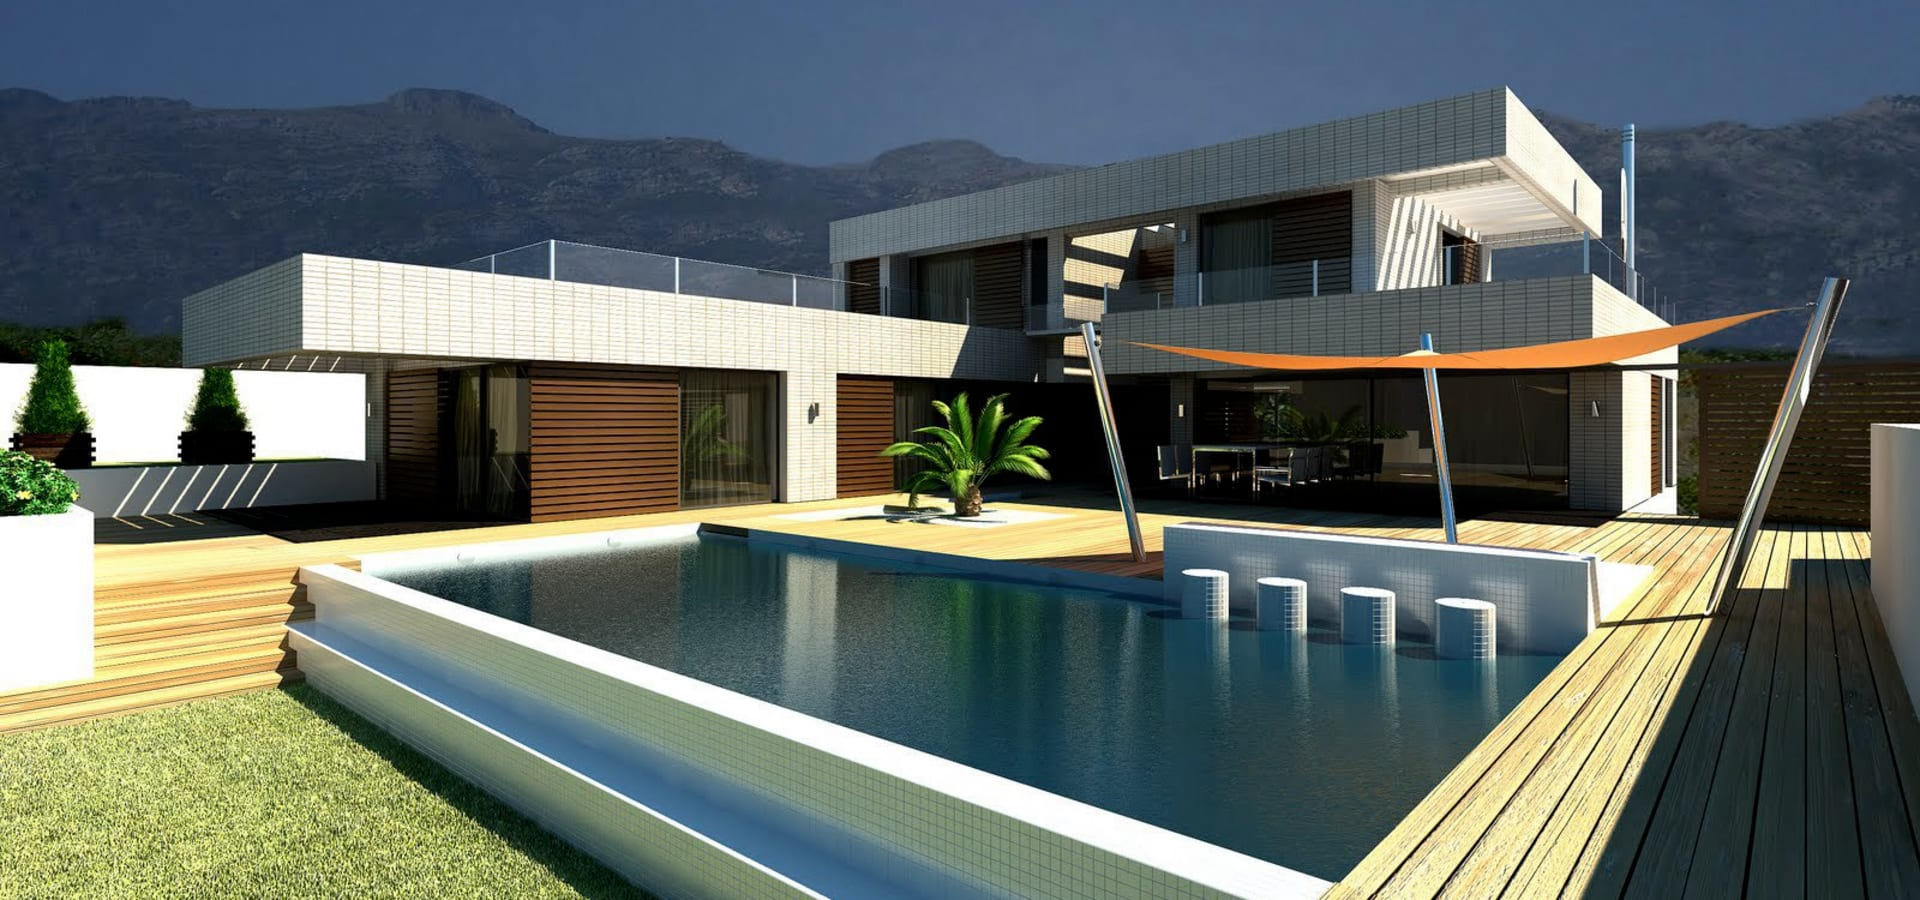 Casa timo von ebano arquitectura de interiores homify for Arquitectura de interiores